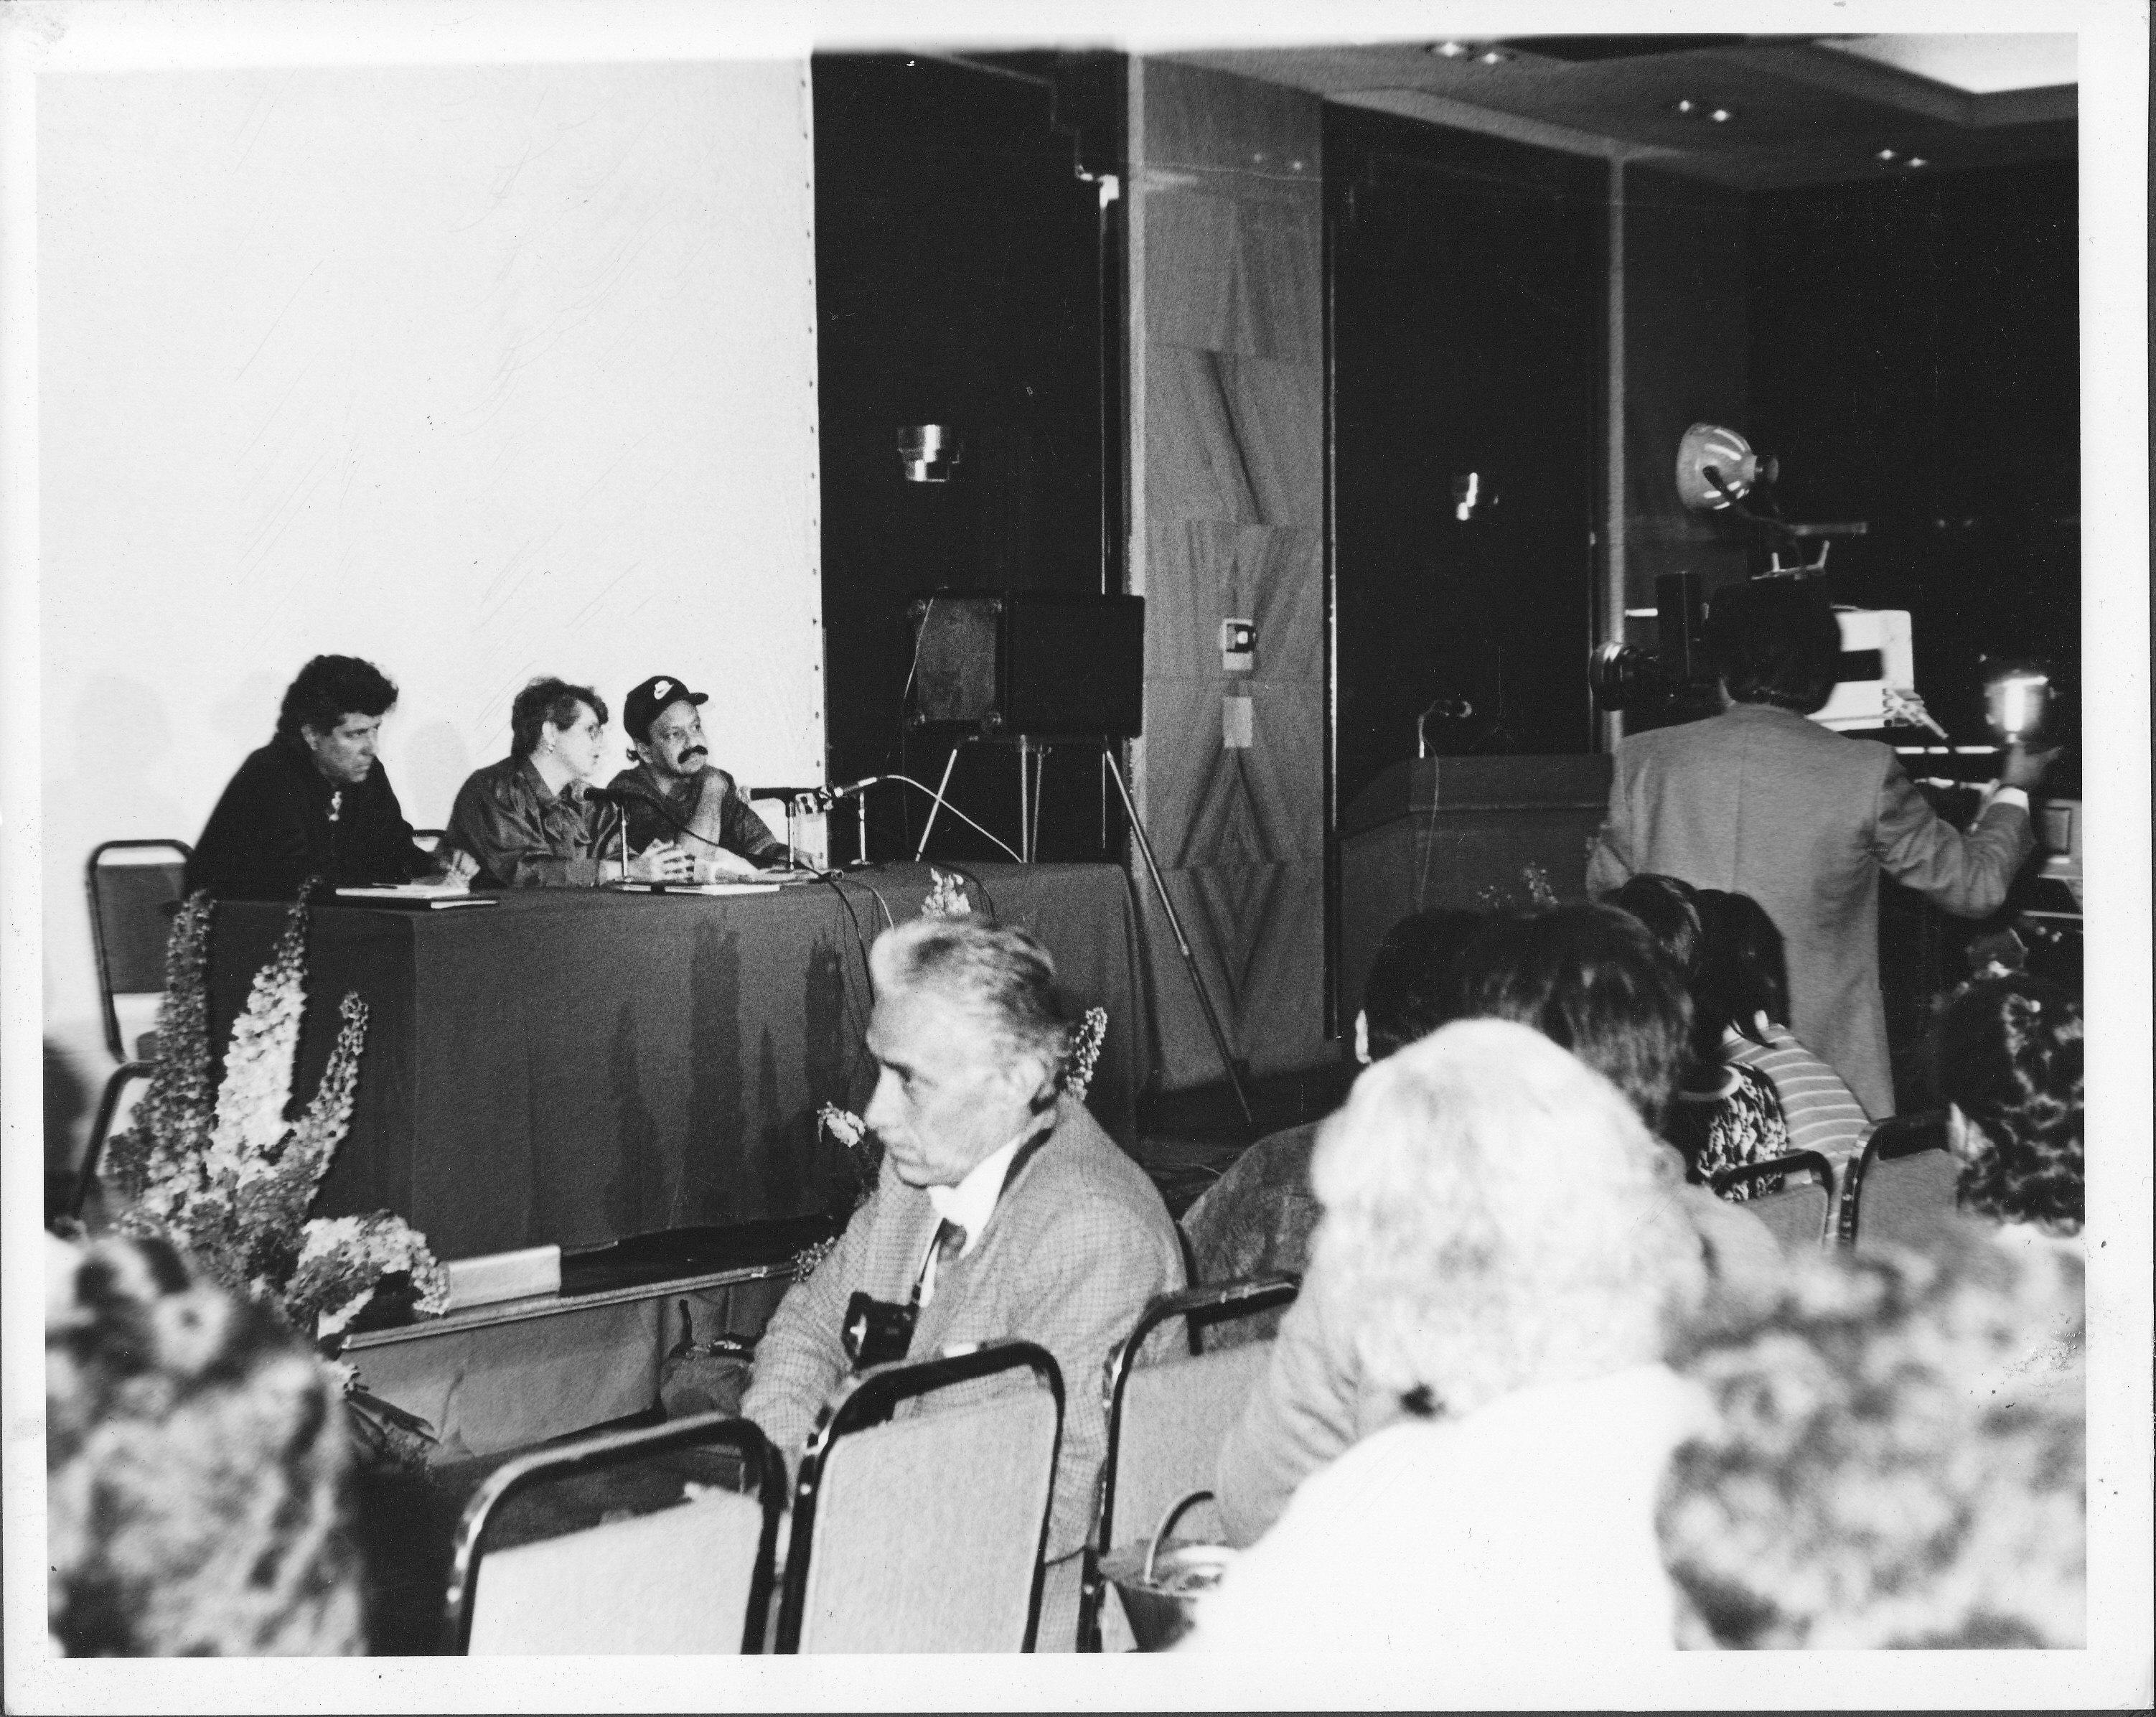 Ruben Funkahuatl Guevara S Tantrik Funk Press Conference